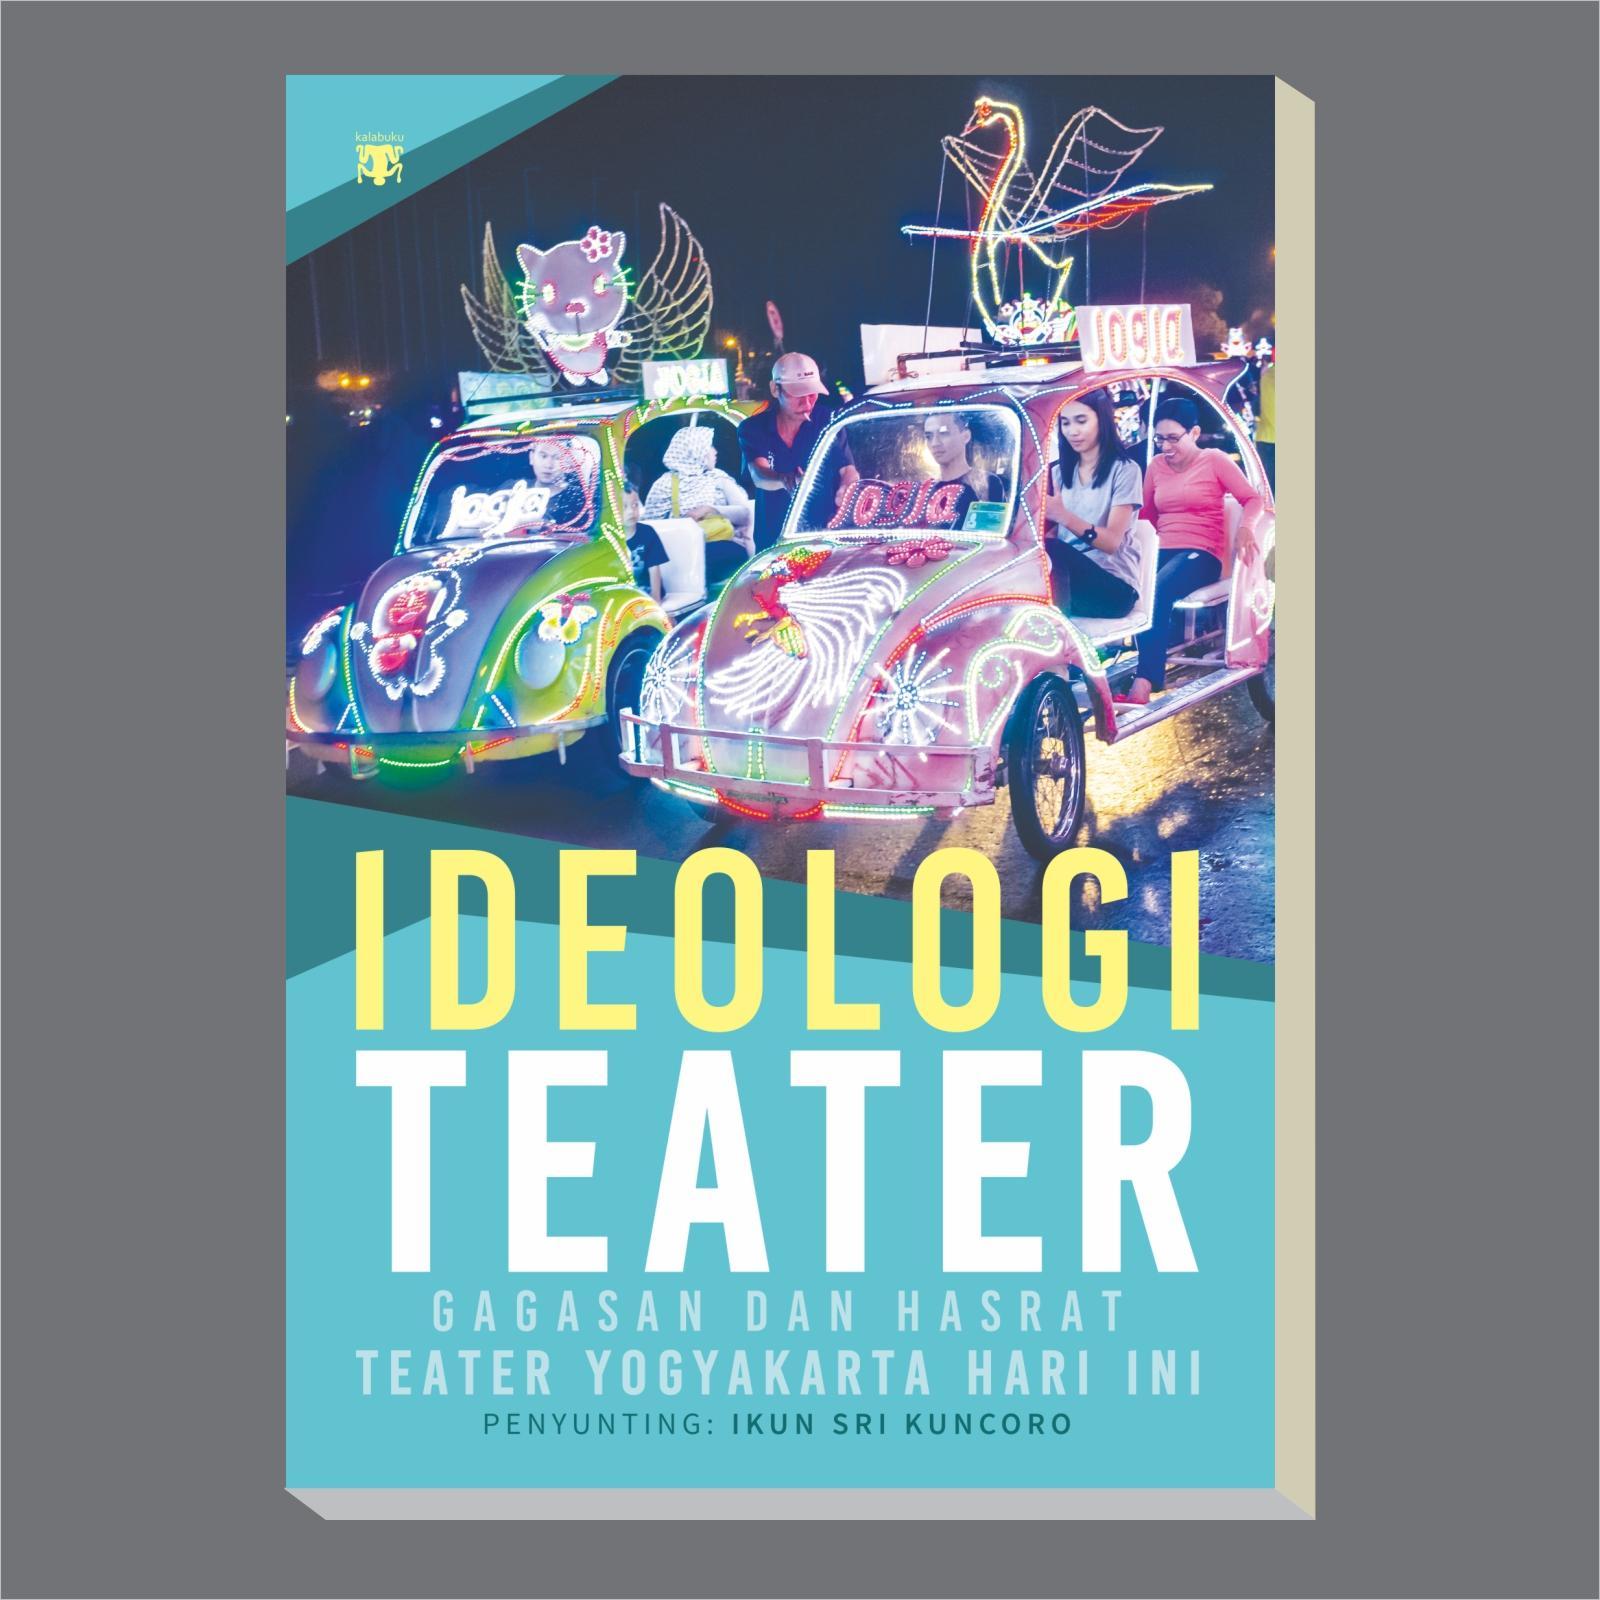 Ideologi Teater : Gagasan dan Hasrat Teater Yogyakarta Hari Ini